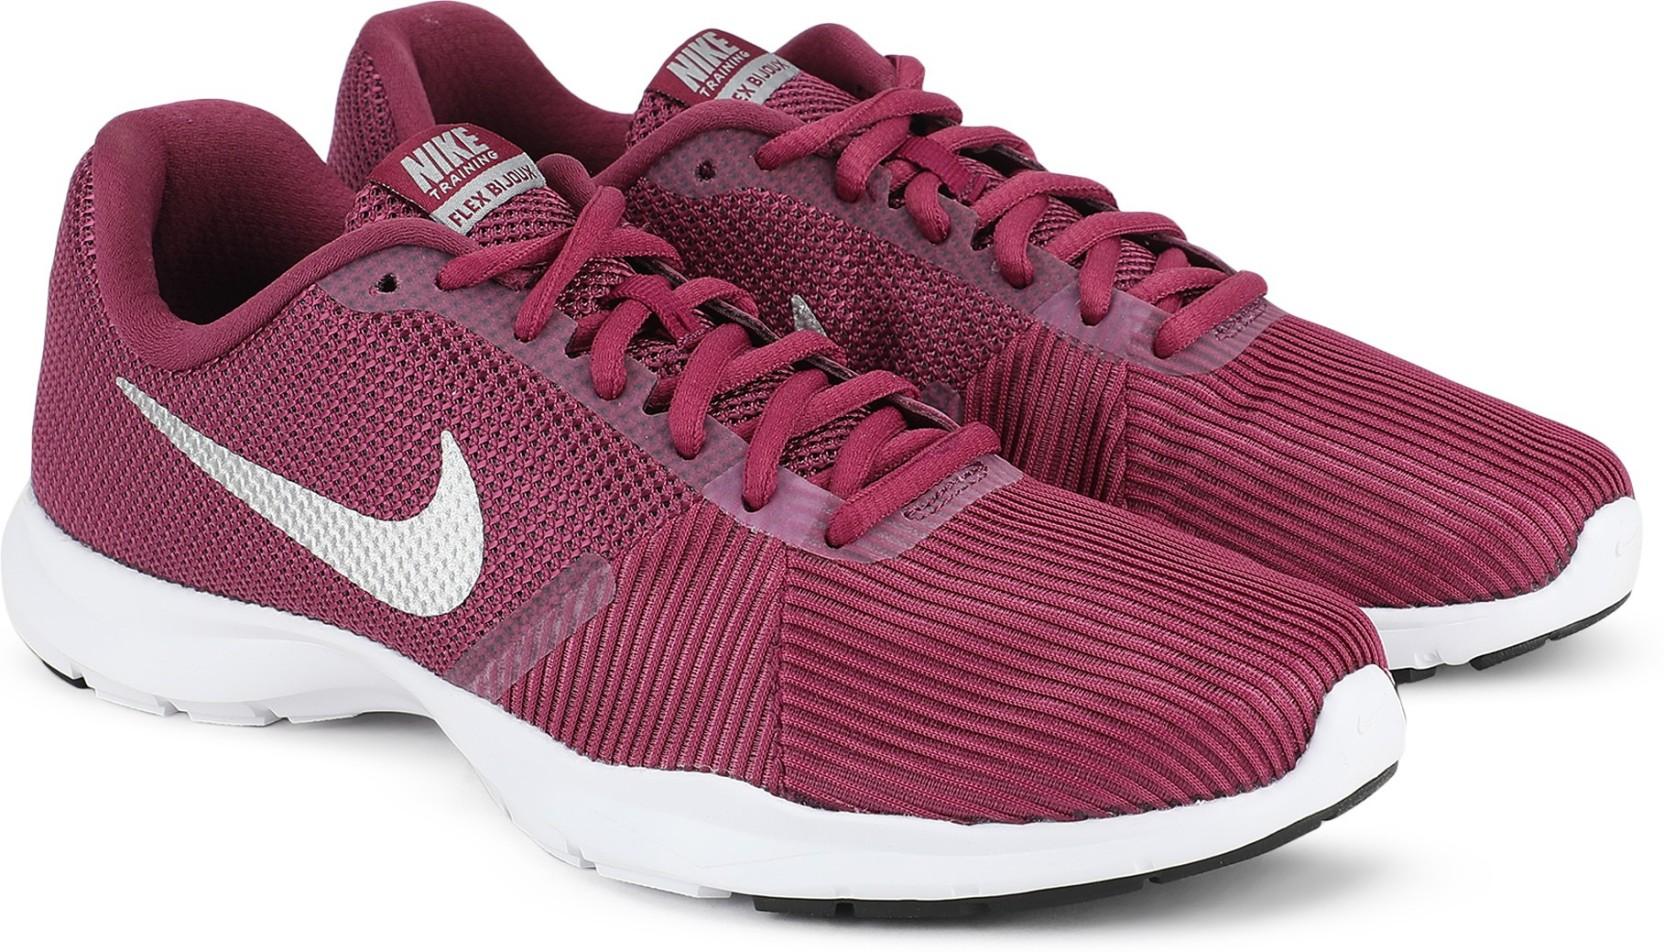 7b008d40b9c6f Nike WMNS FLEX BIJOUX Training   Gym Shoes For Women - Buy Purple ...